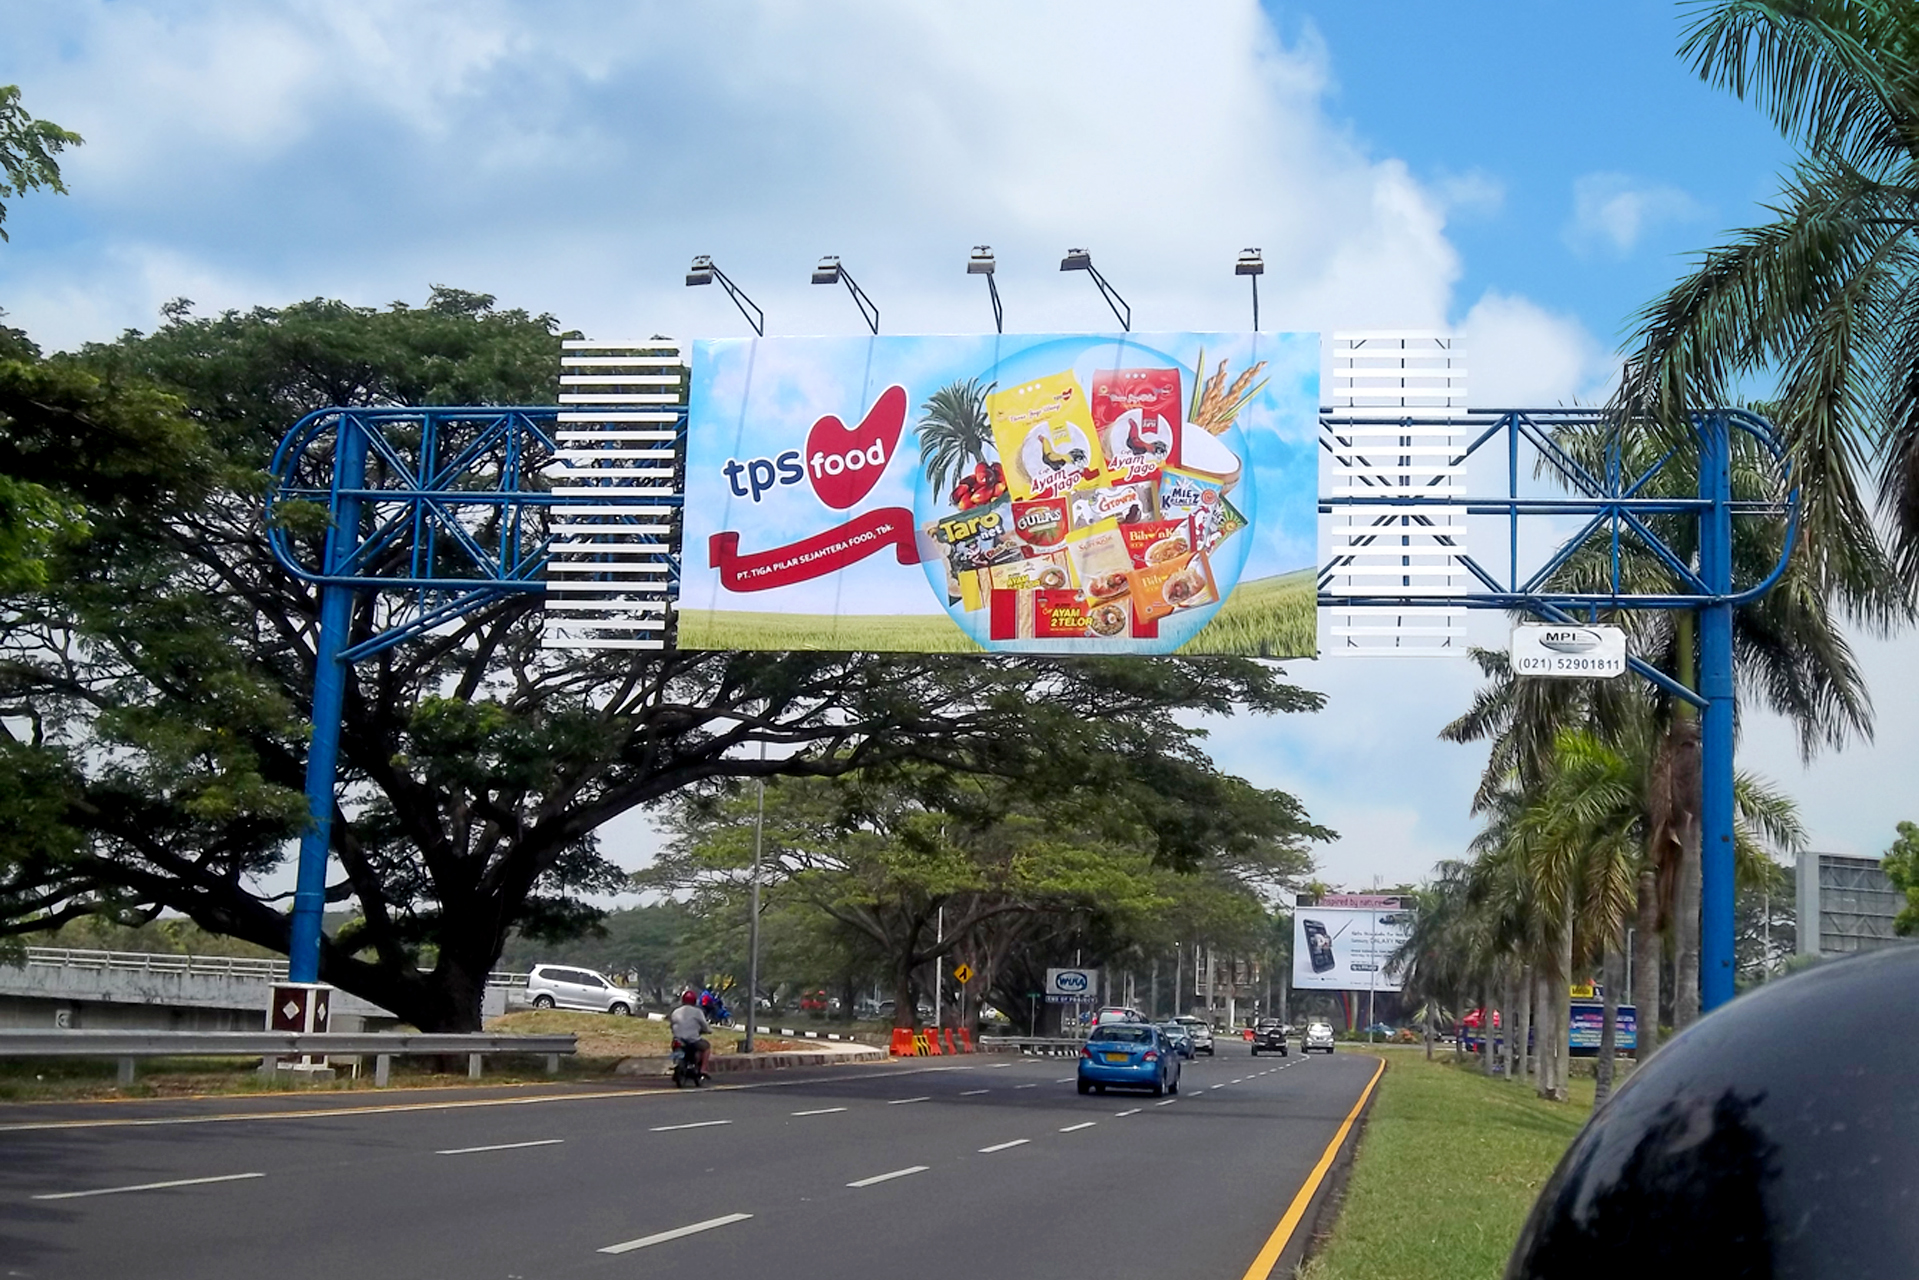 TPS Food - Bando Jl P2 bandara Soetta